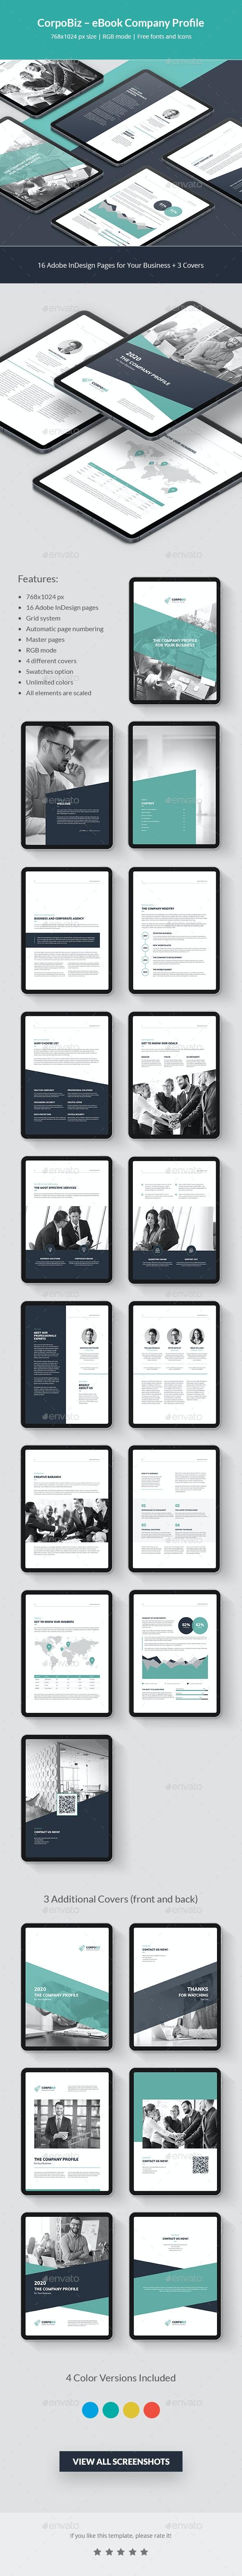 CorpoBiz – Business and Corporate eBook Company Profile - Digital Books ePublishing